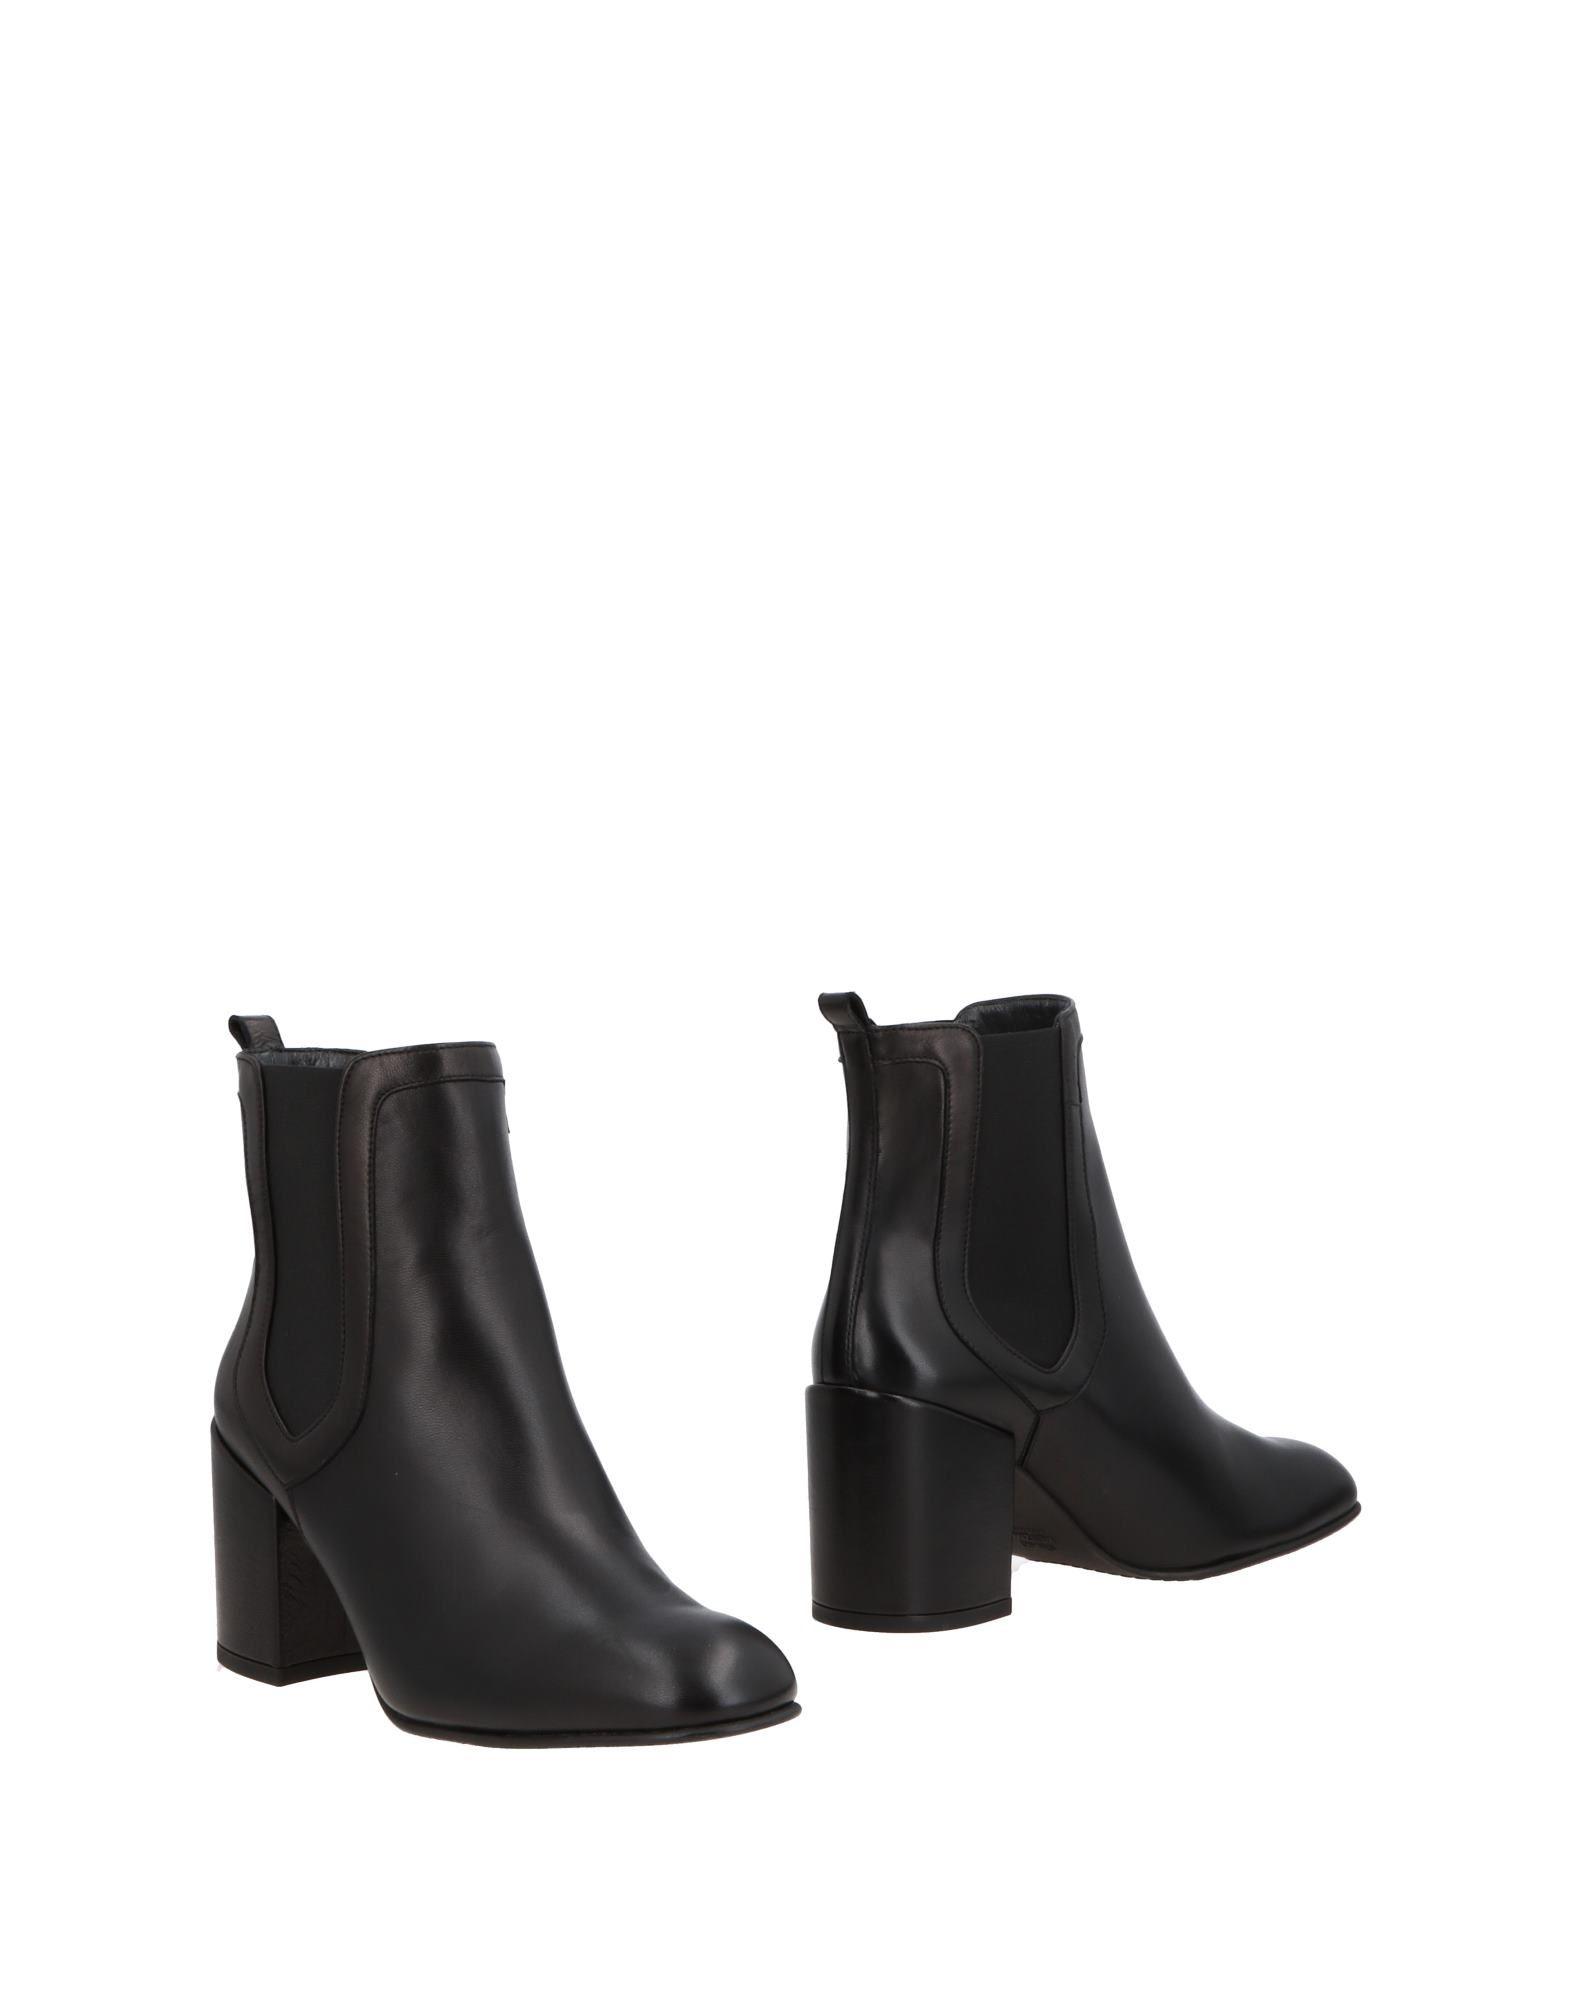 STUART WEITZMAN Полусапоги и высокие ботинки ботинки высокие stuart weitzman ботинки на каблуке